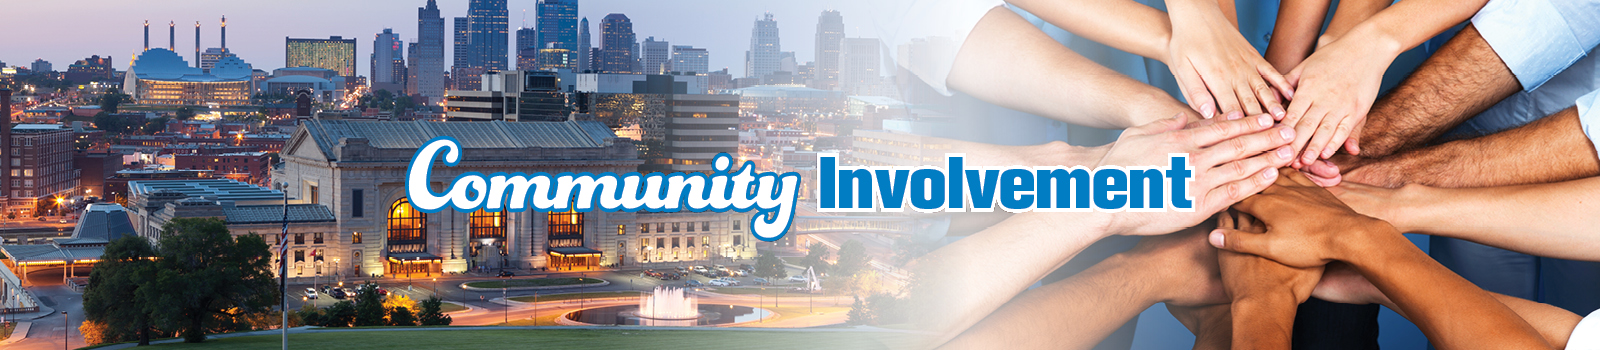 McCarthy Auto Group - Serving the Kansas City Community & Beyond